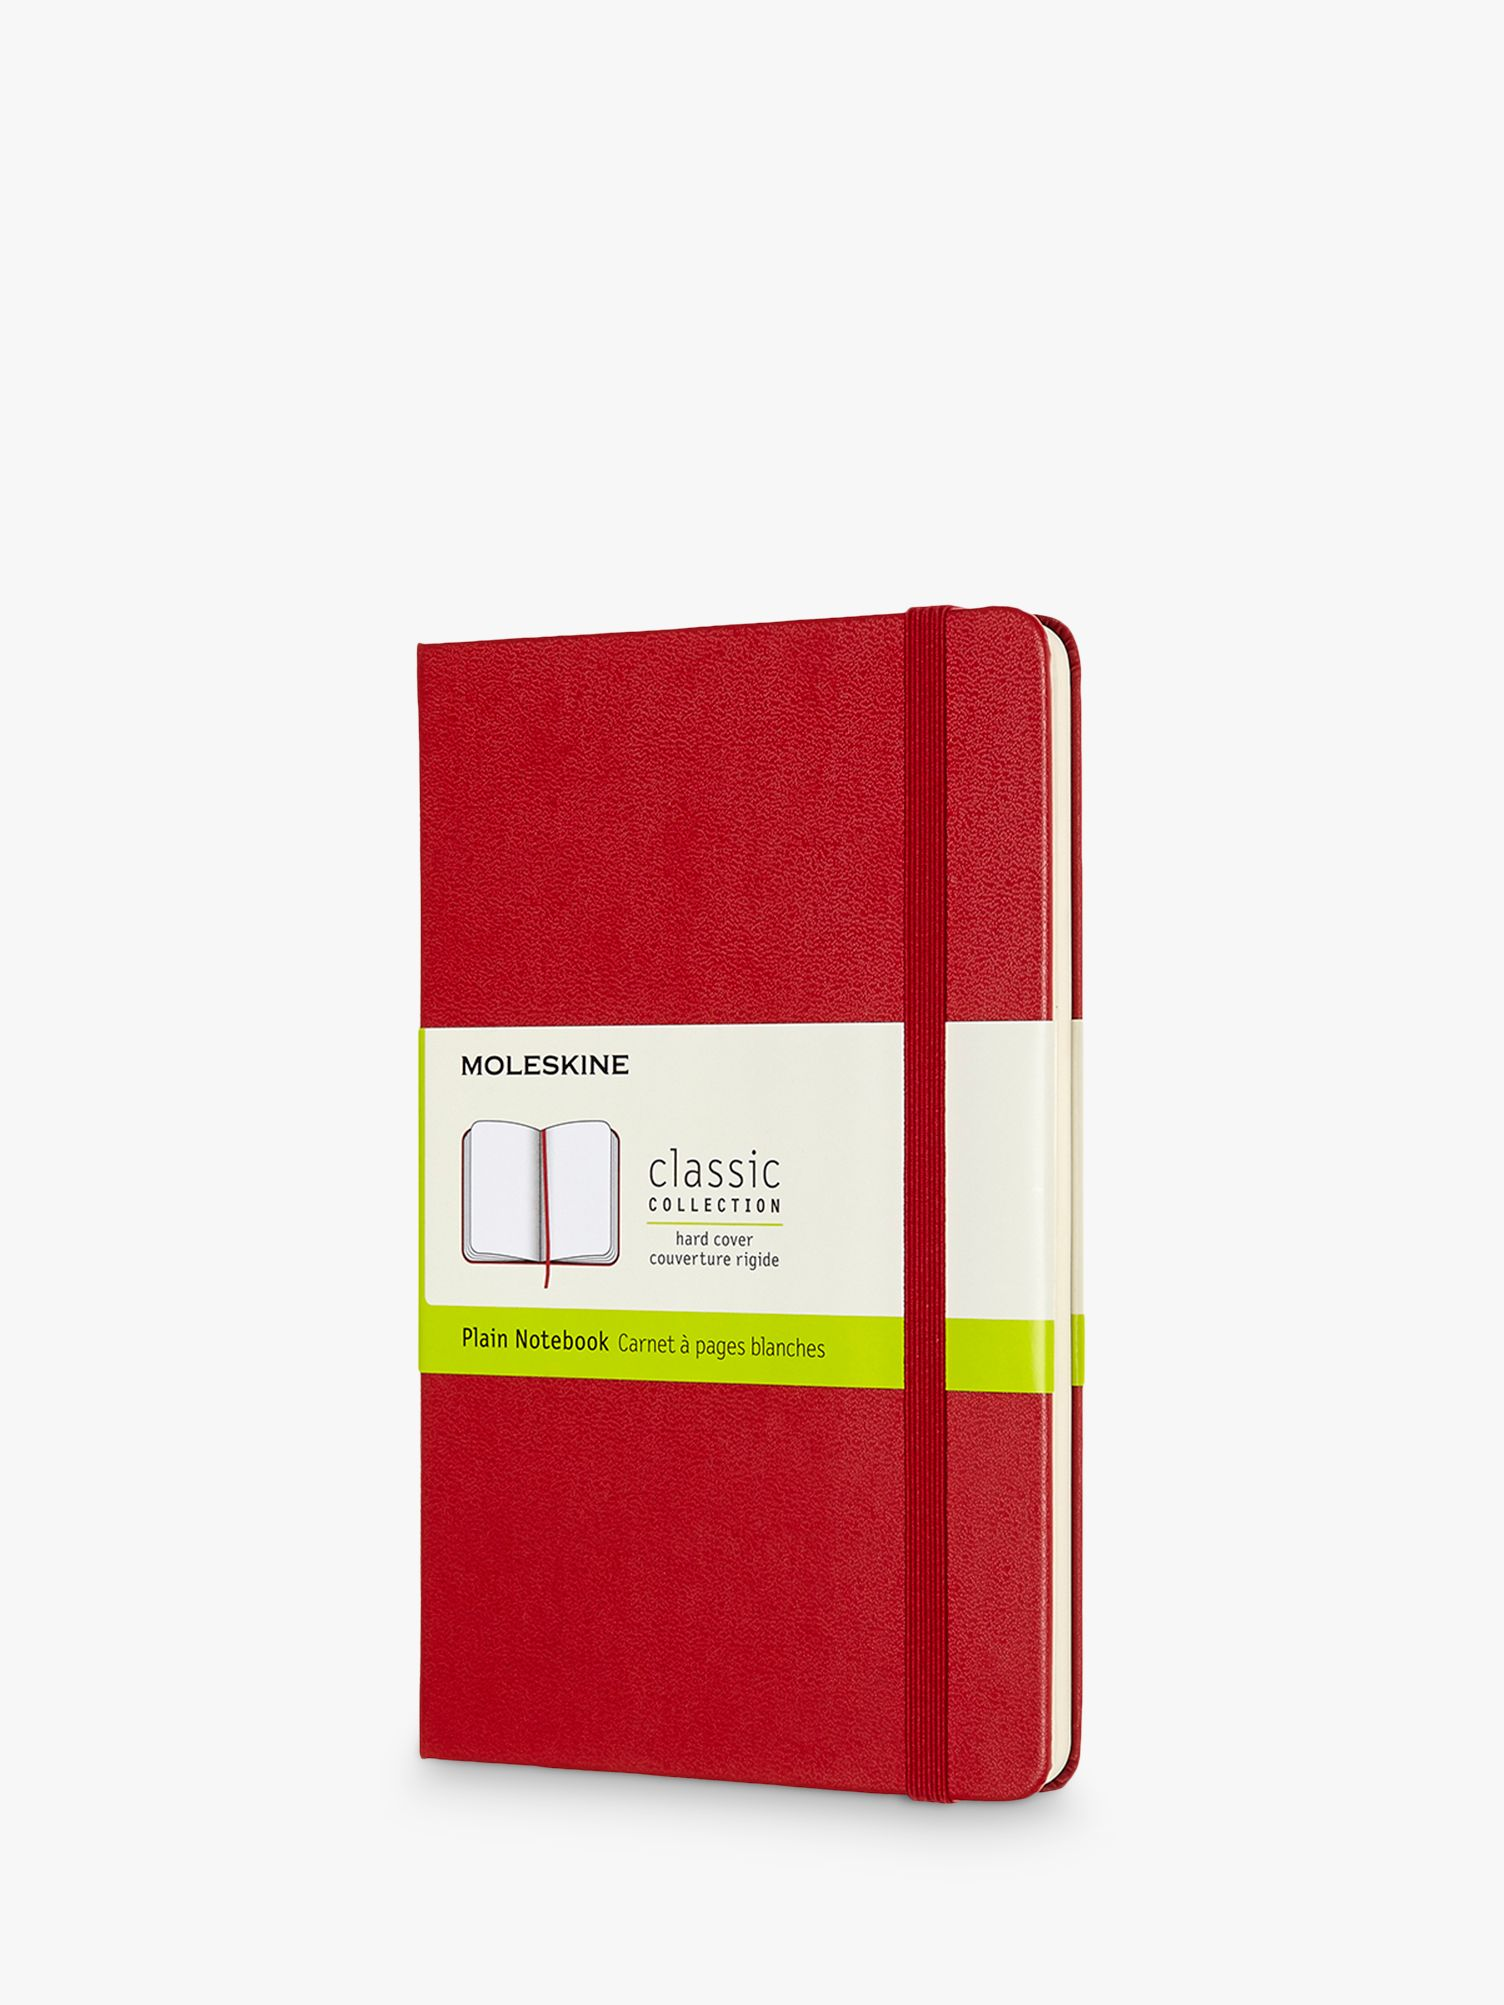 Moleskine Moleskine Medium Hardcover Plain Notebook